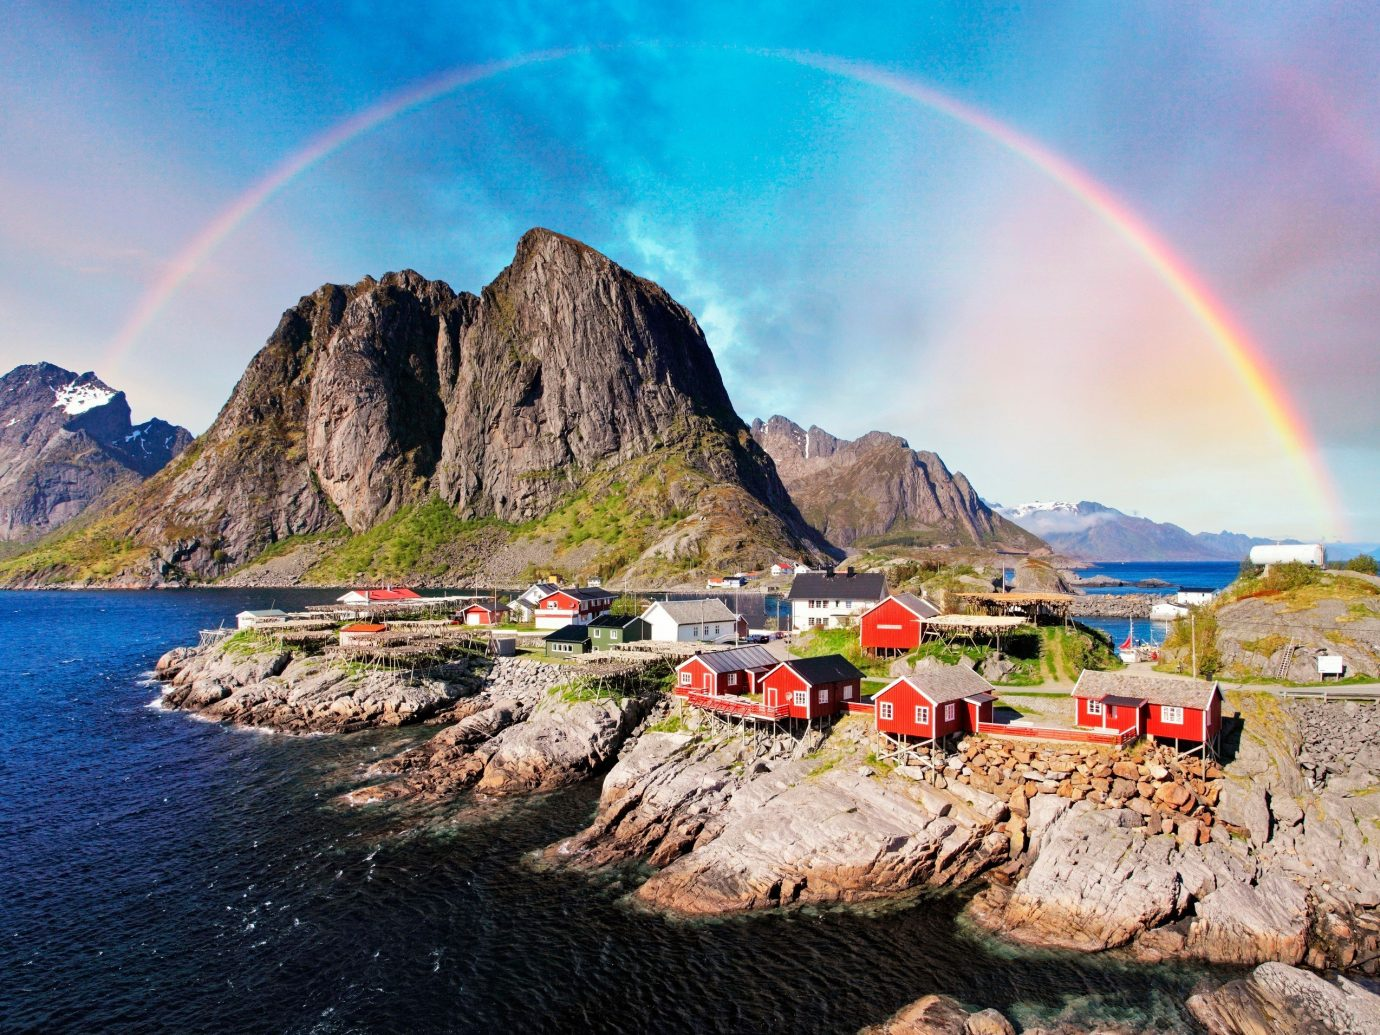 Secret Getaways Trip Ideas mountain water sky outdoor Nature rainbow Coast Sea landscape meteorological phenomenon mountain range fjord terrain